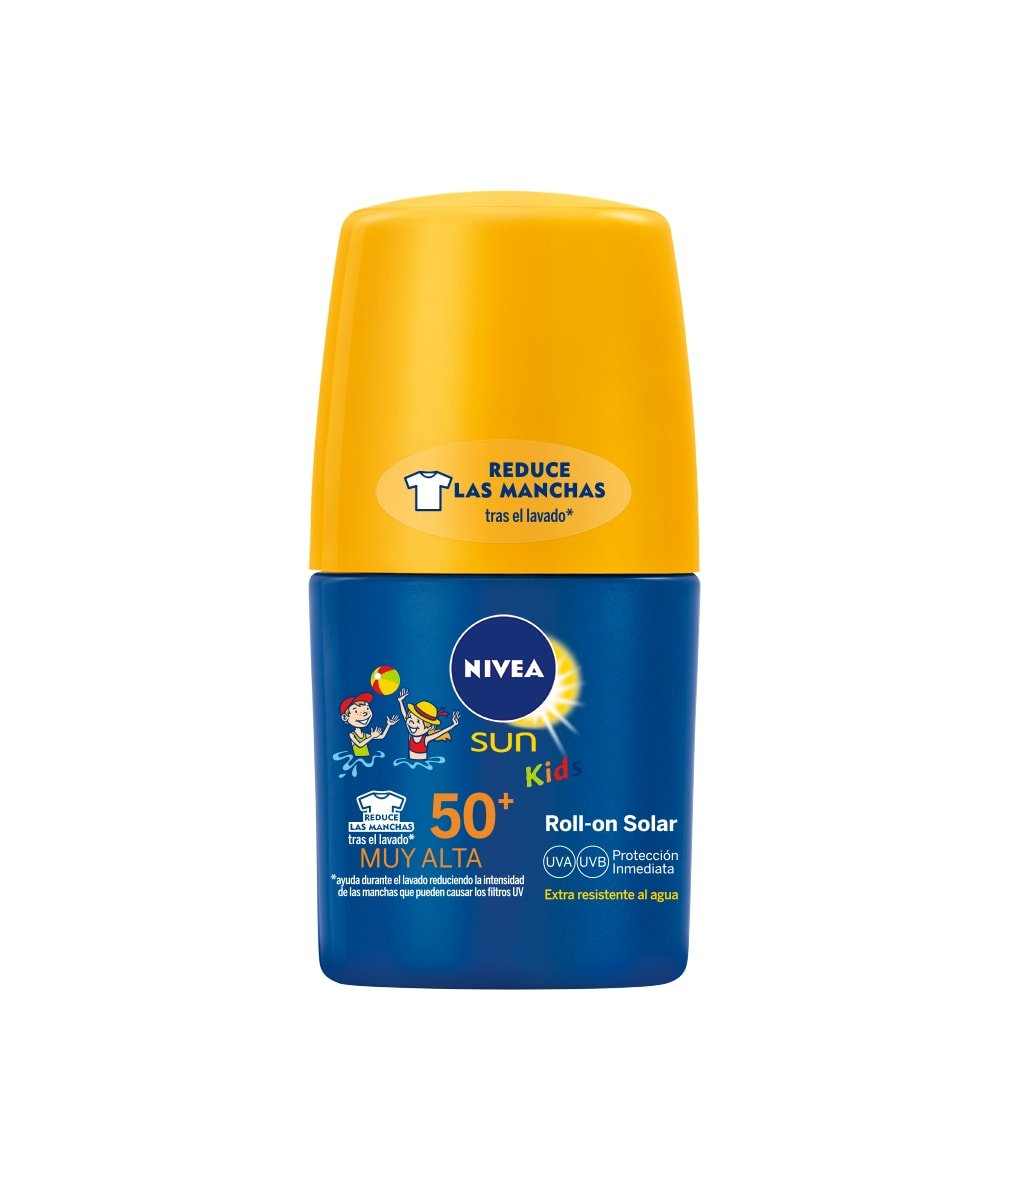 Nivea Sun Kids - Roll On crema solar niños FP50 - Protección UV muy alta - 50 ml Beiersdorf 4005900257017